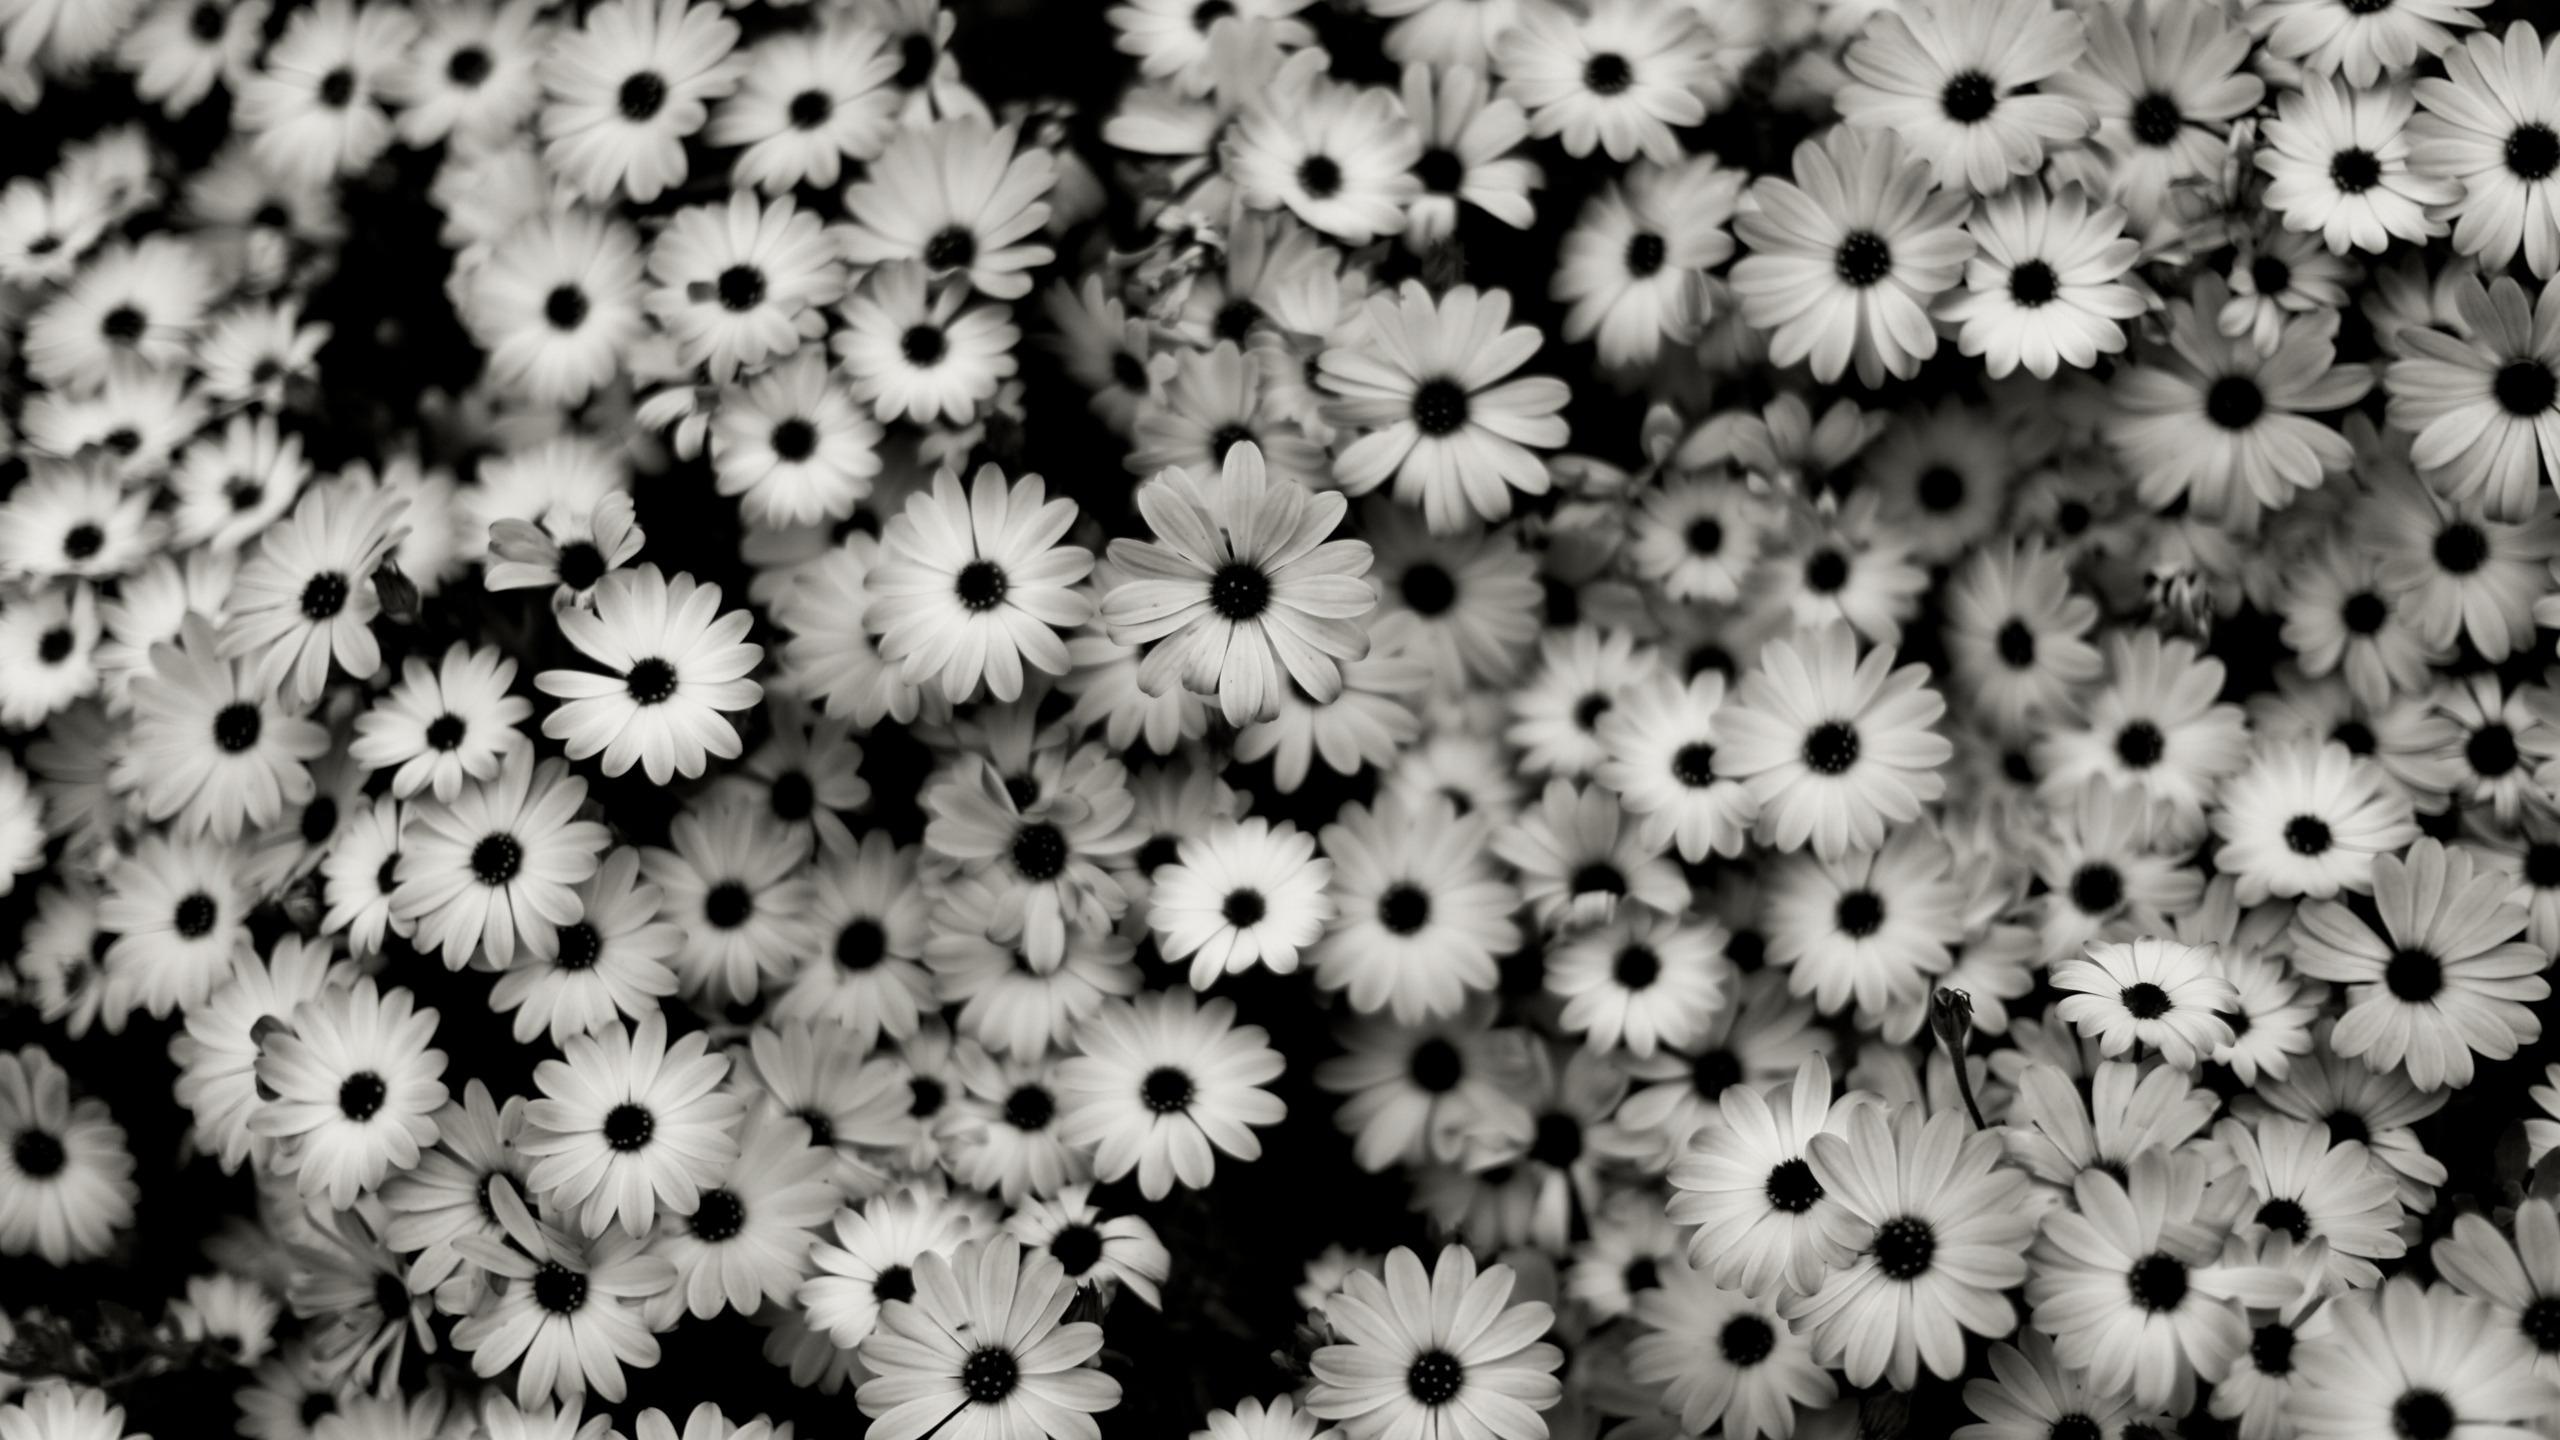 fond d ecran monochrome fleurs